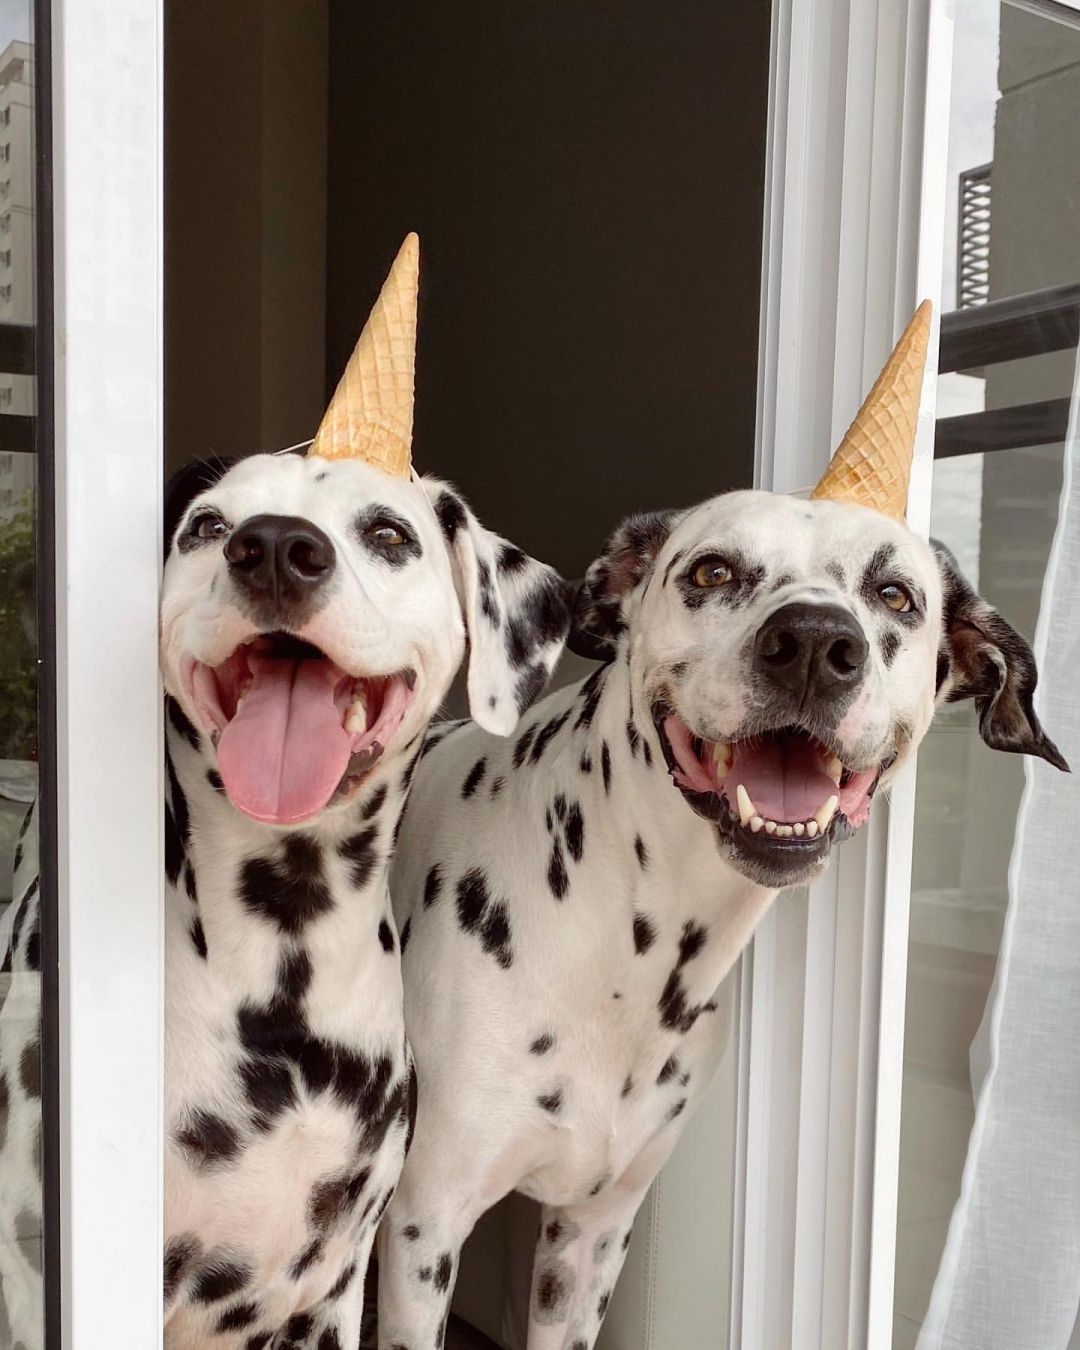 credit: @pingoeninadalmatians... #dog #dogsofinstagram #dogs #puppy #dogstagram #instadog #pet #doglover #love #dogoftheday #cute #doglovers #instagram #pets #of #puppylove #doggo #puppies #cat #doglife #puppiesofinstagram #ilovemydog #dogsofinsta #animals #hund #doggy #petstagram #k #animal